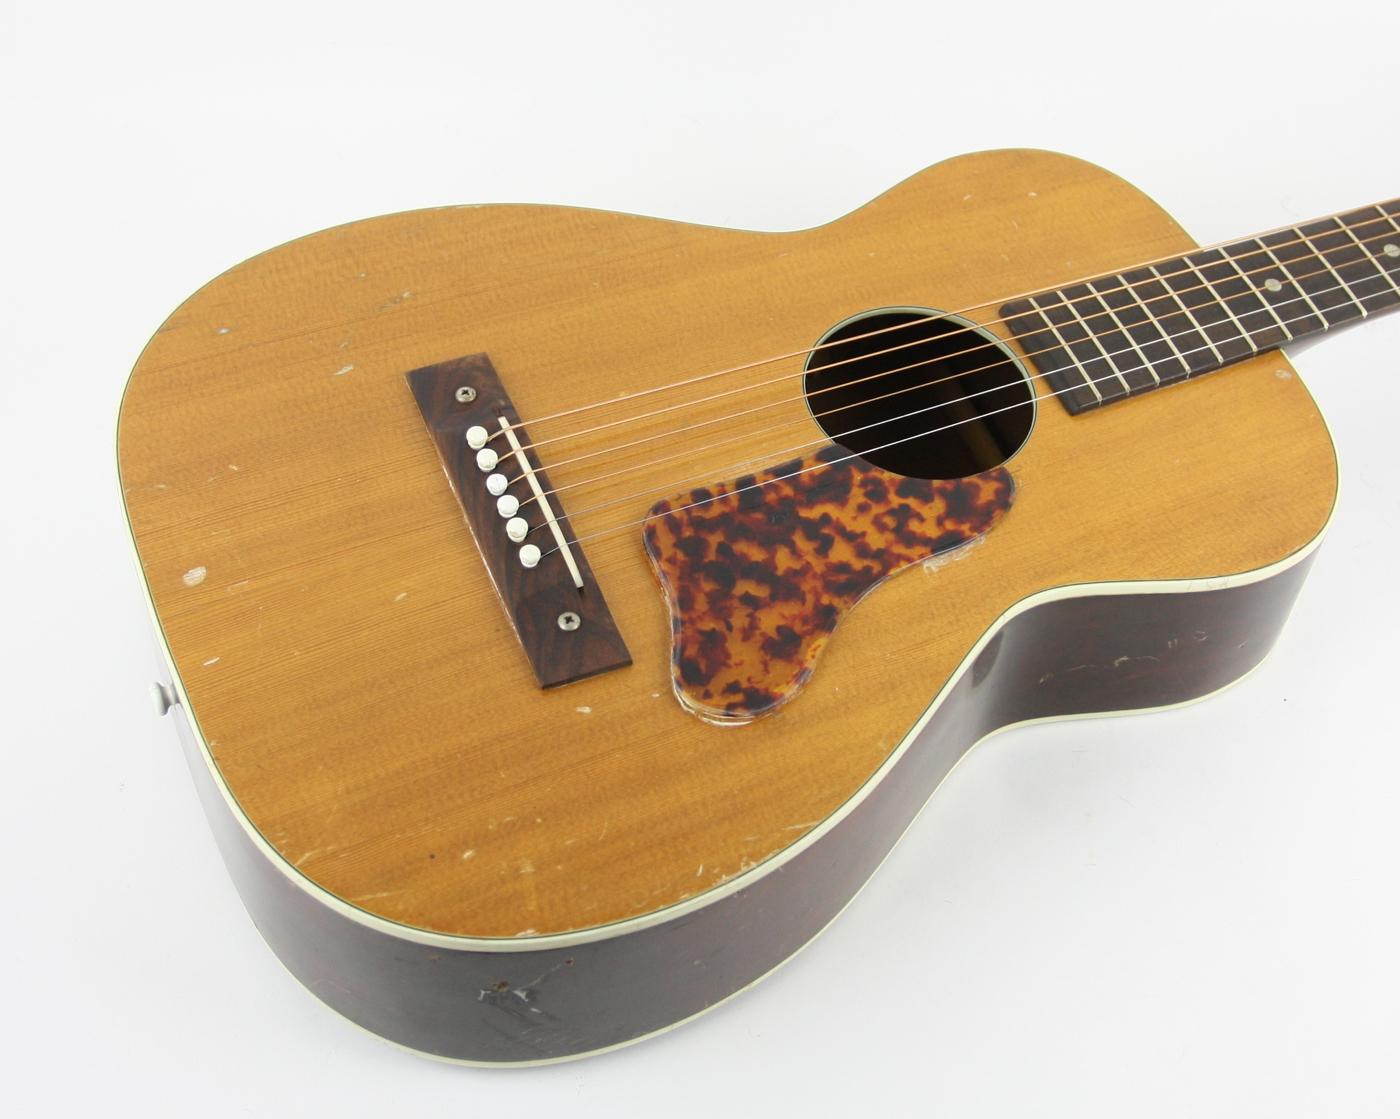 1960s Regal/Harmony Parlor Acoustic detail 1